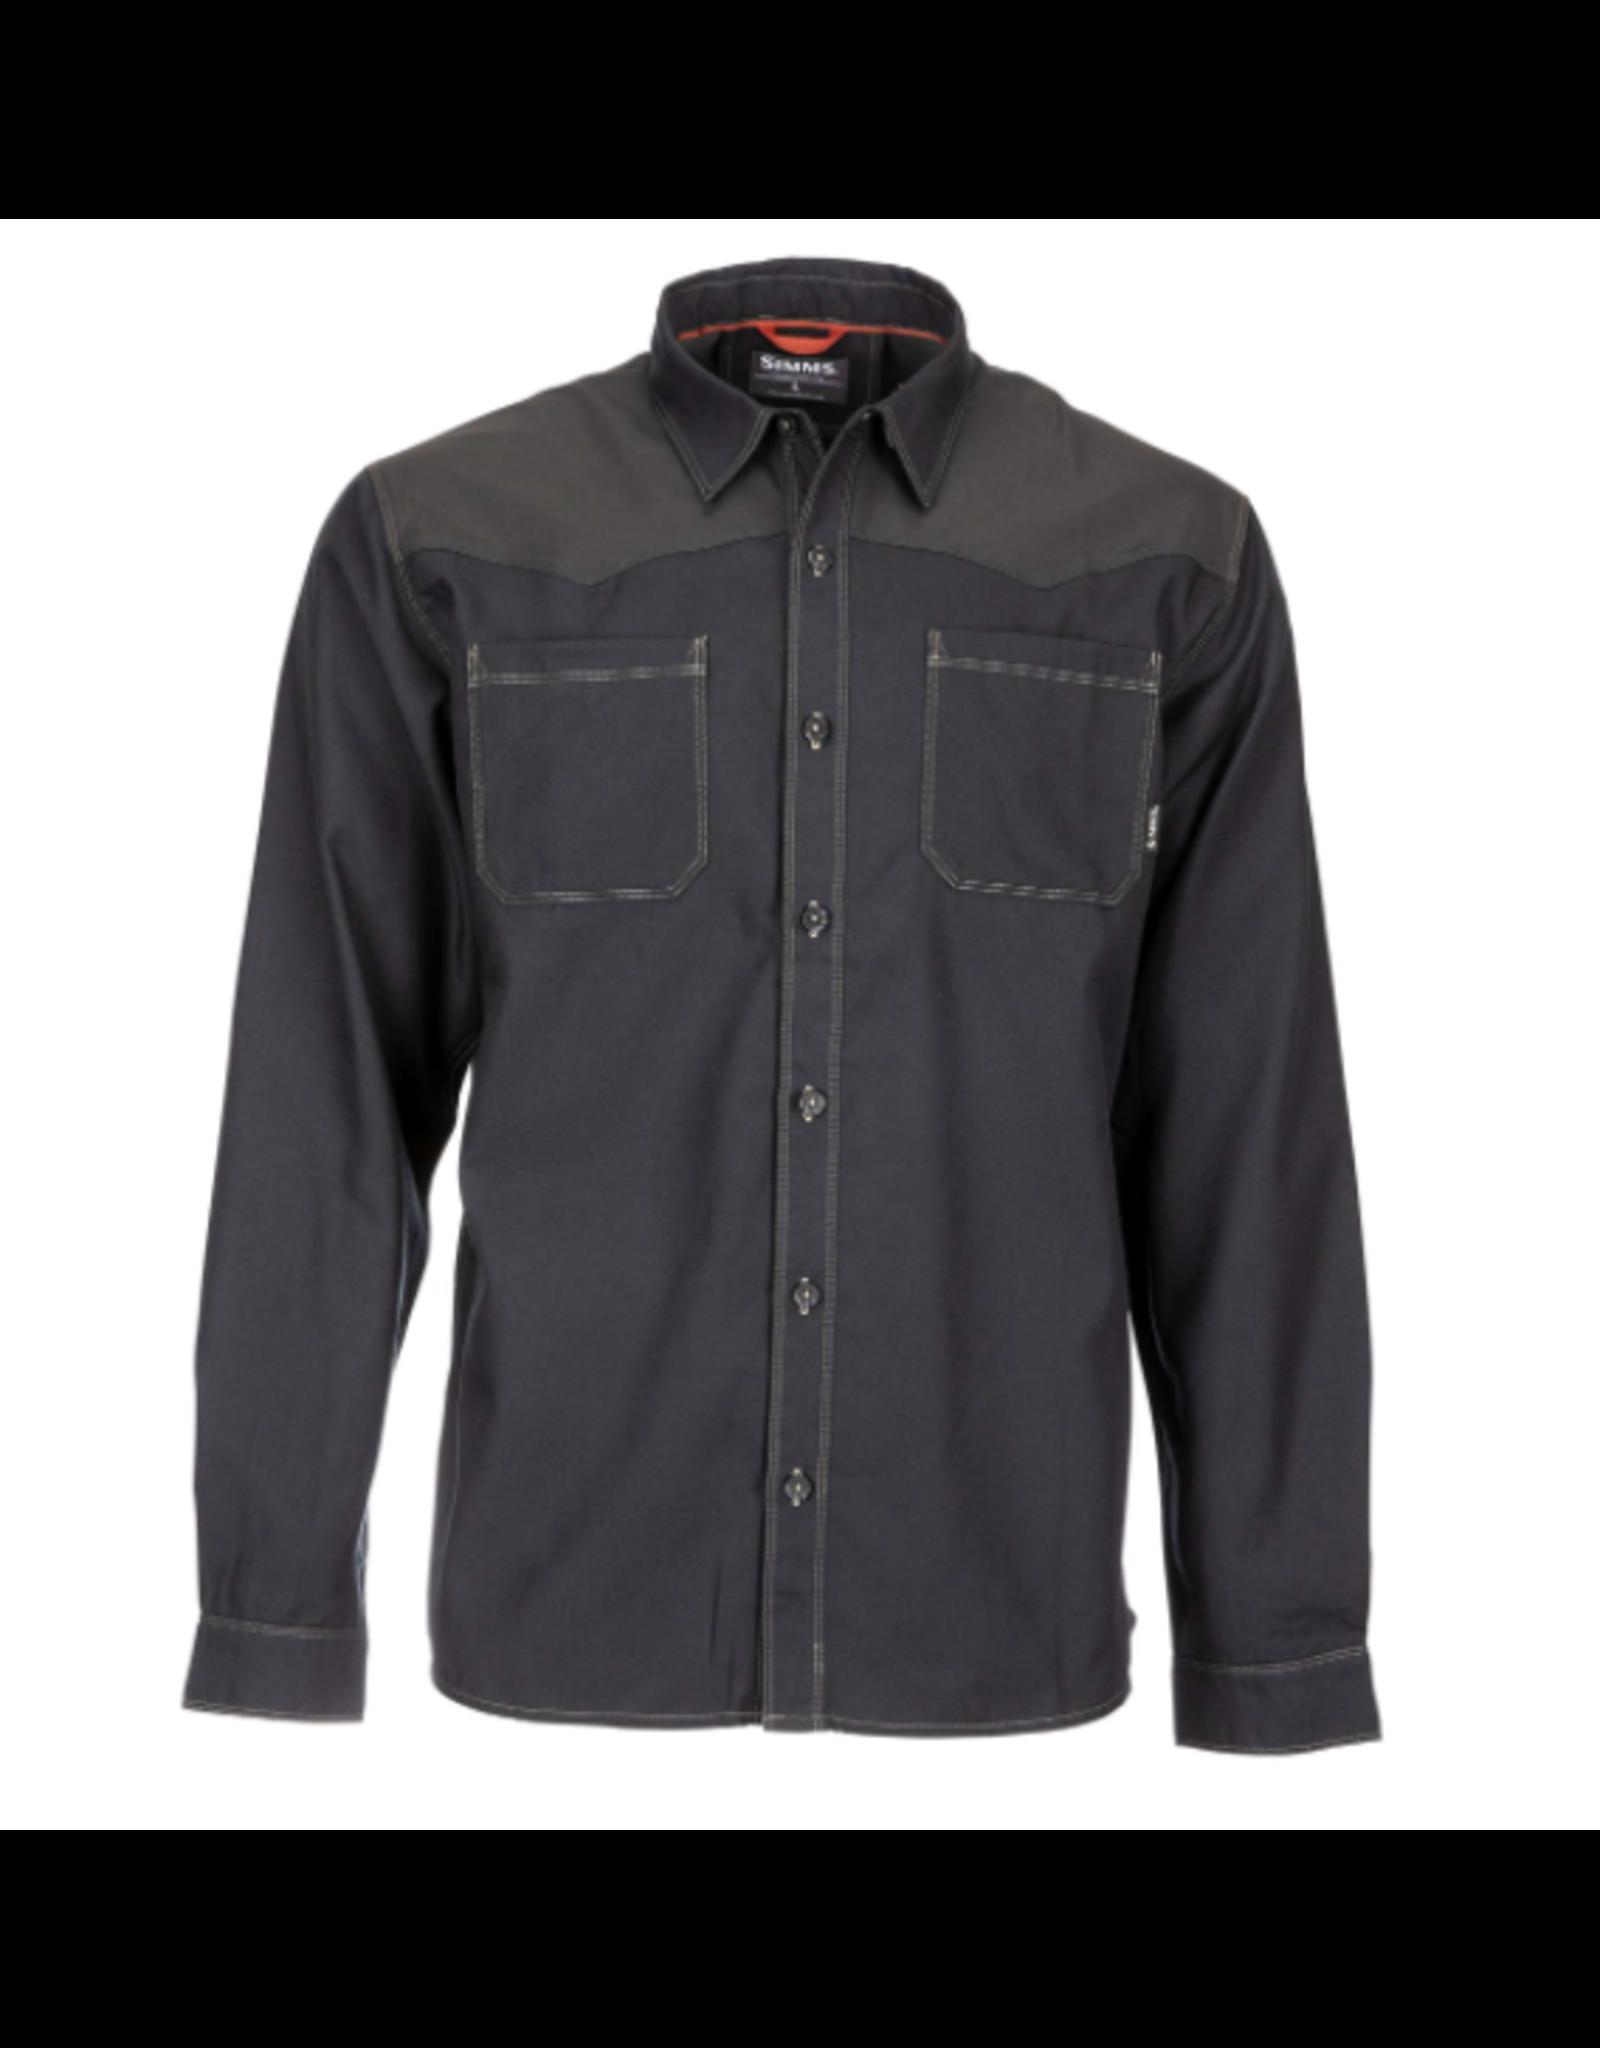 Simms SIMMS Black's Ford Flannel LS Shirt